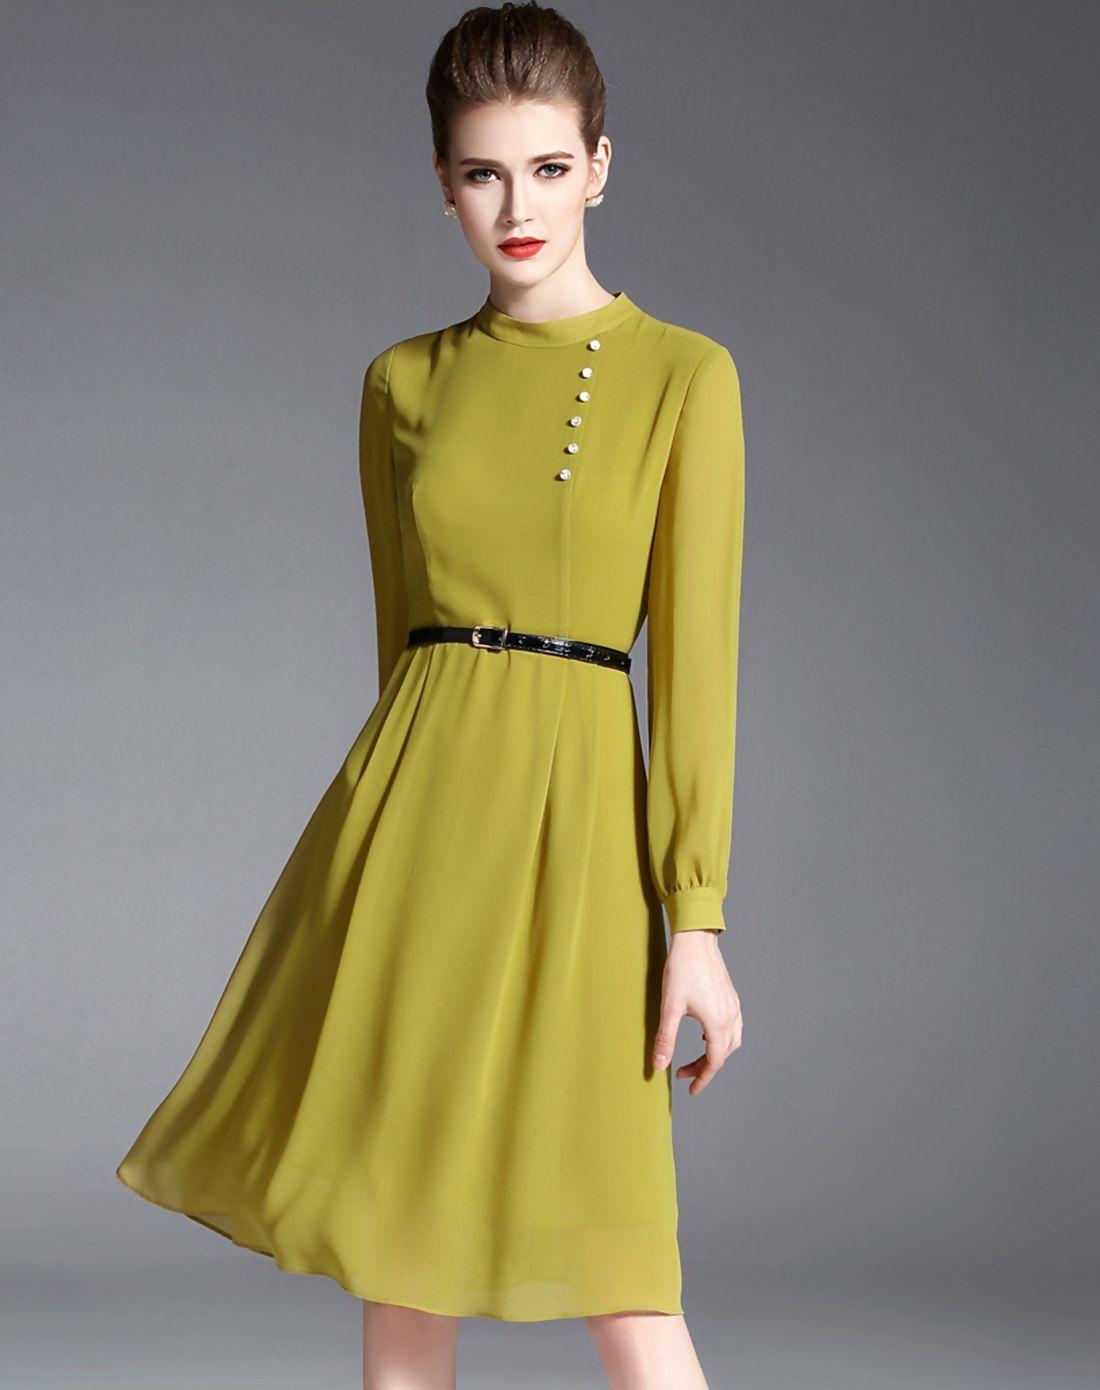 Adorewe Vipme A Line Dresses Designer Gyalwana Yellow Chiffon Long Sleeve Slim Fit Dress